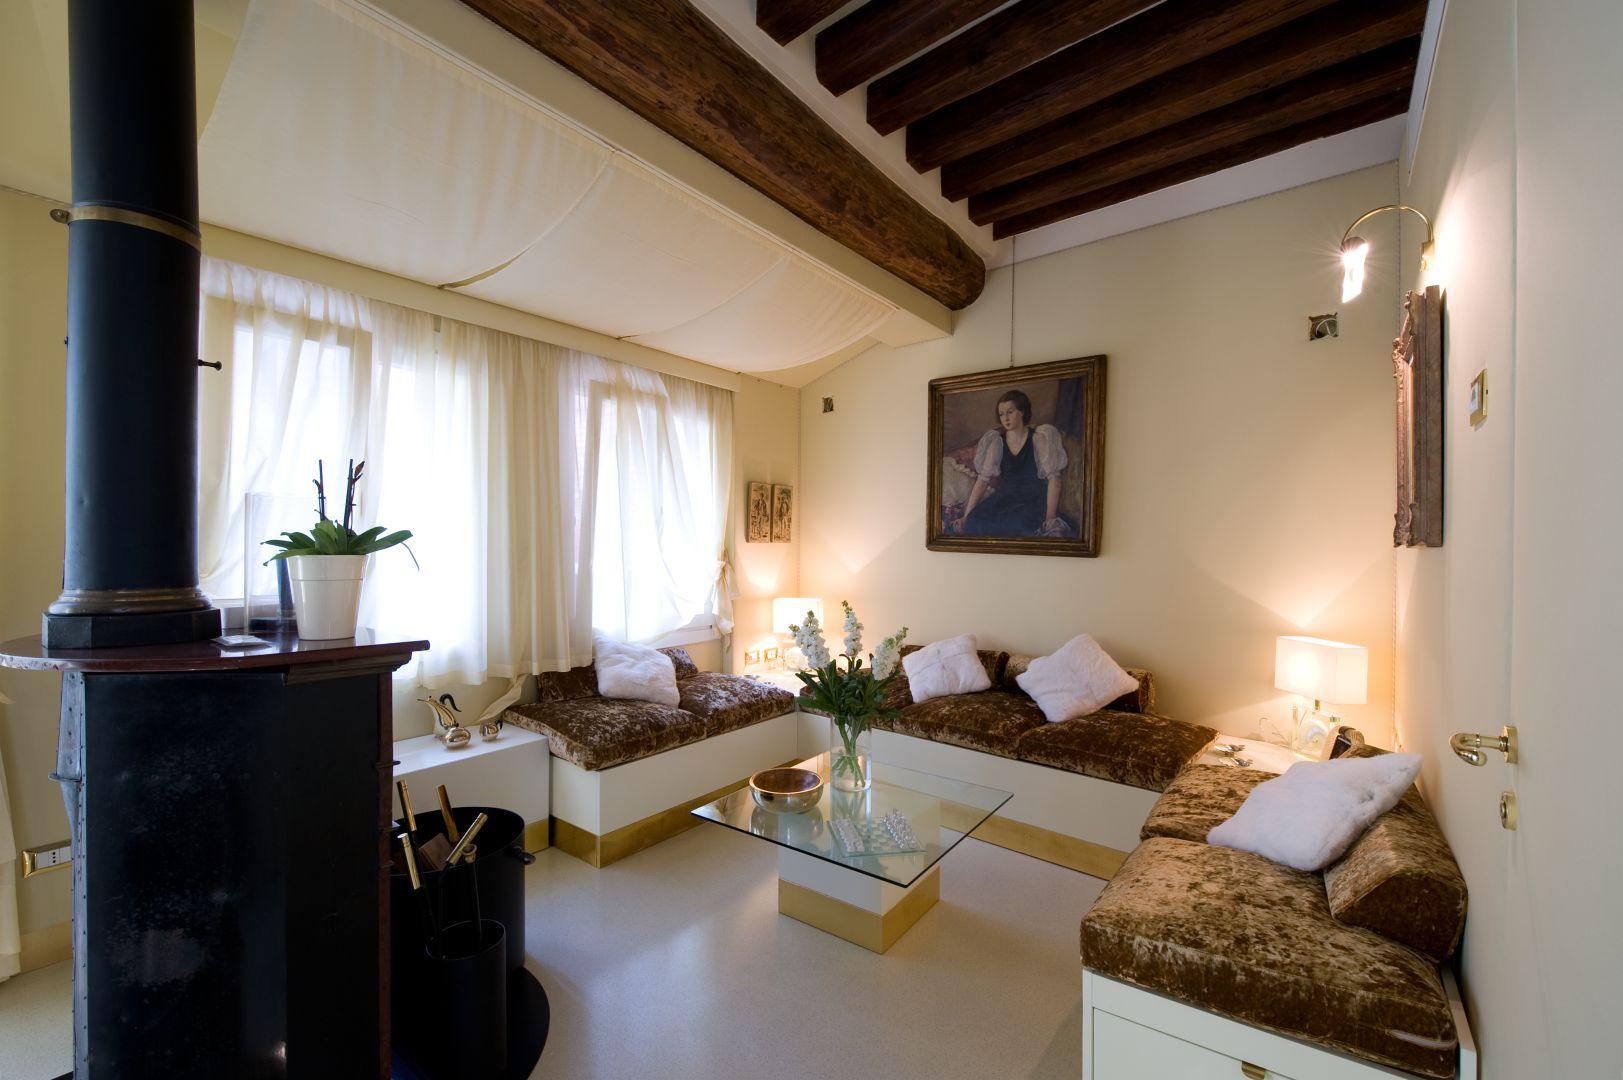 Residenza storica Venezia - Vimar energia positiva